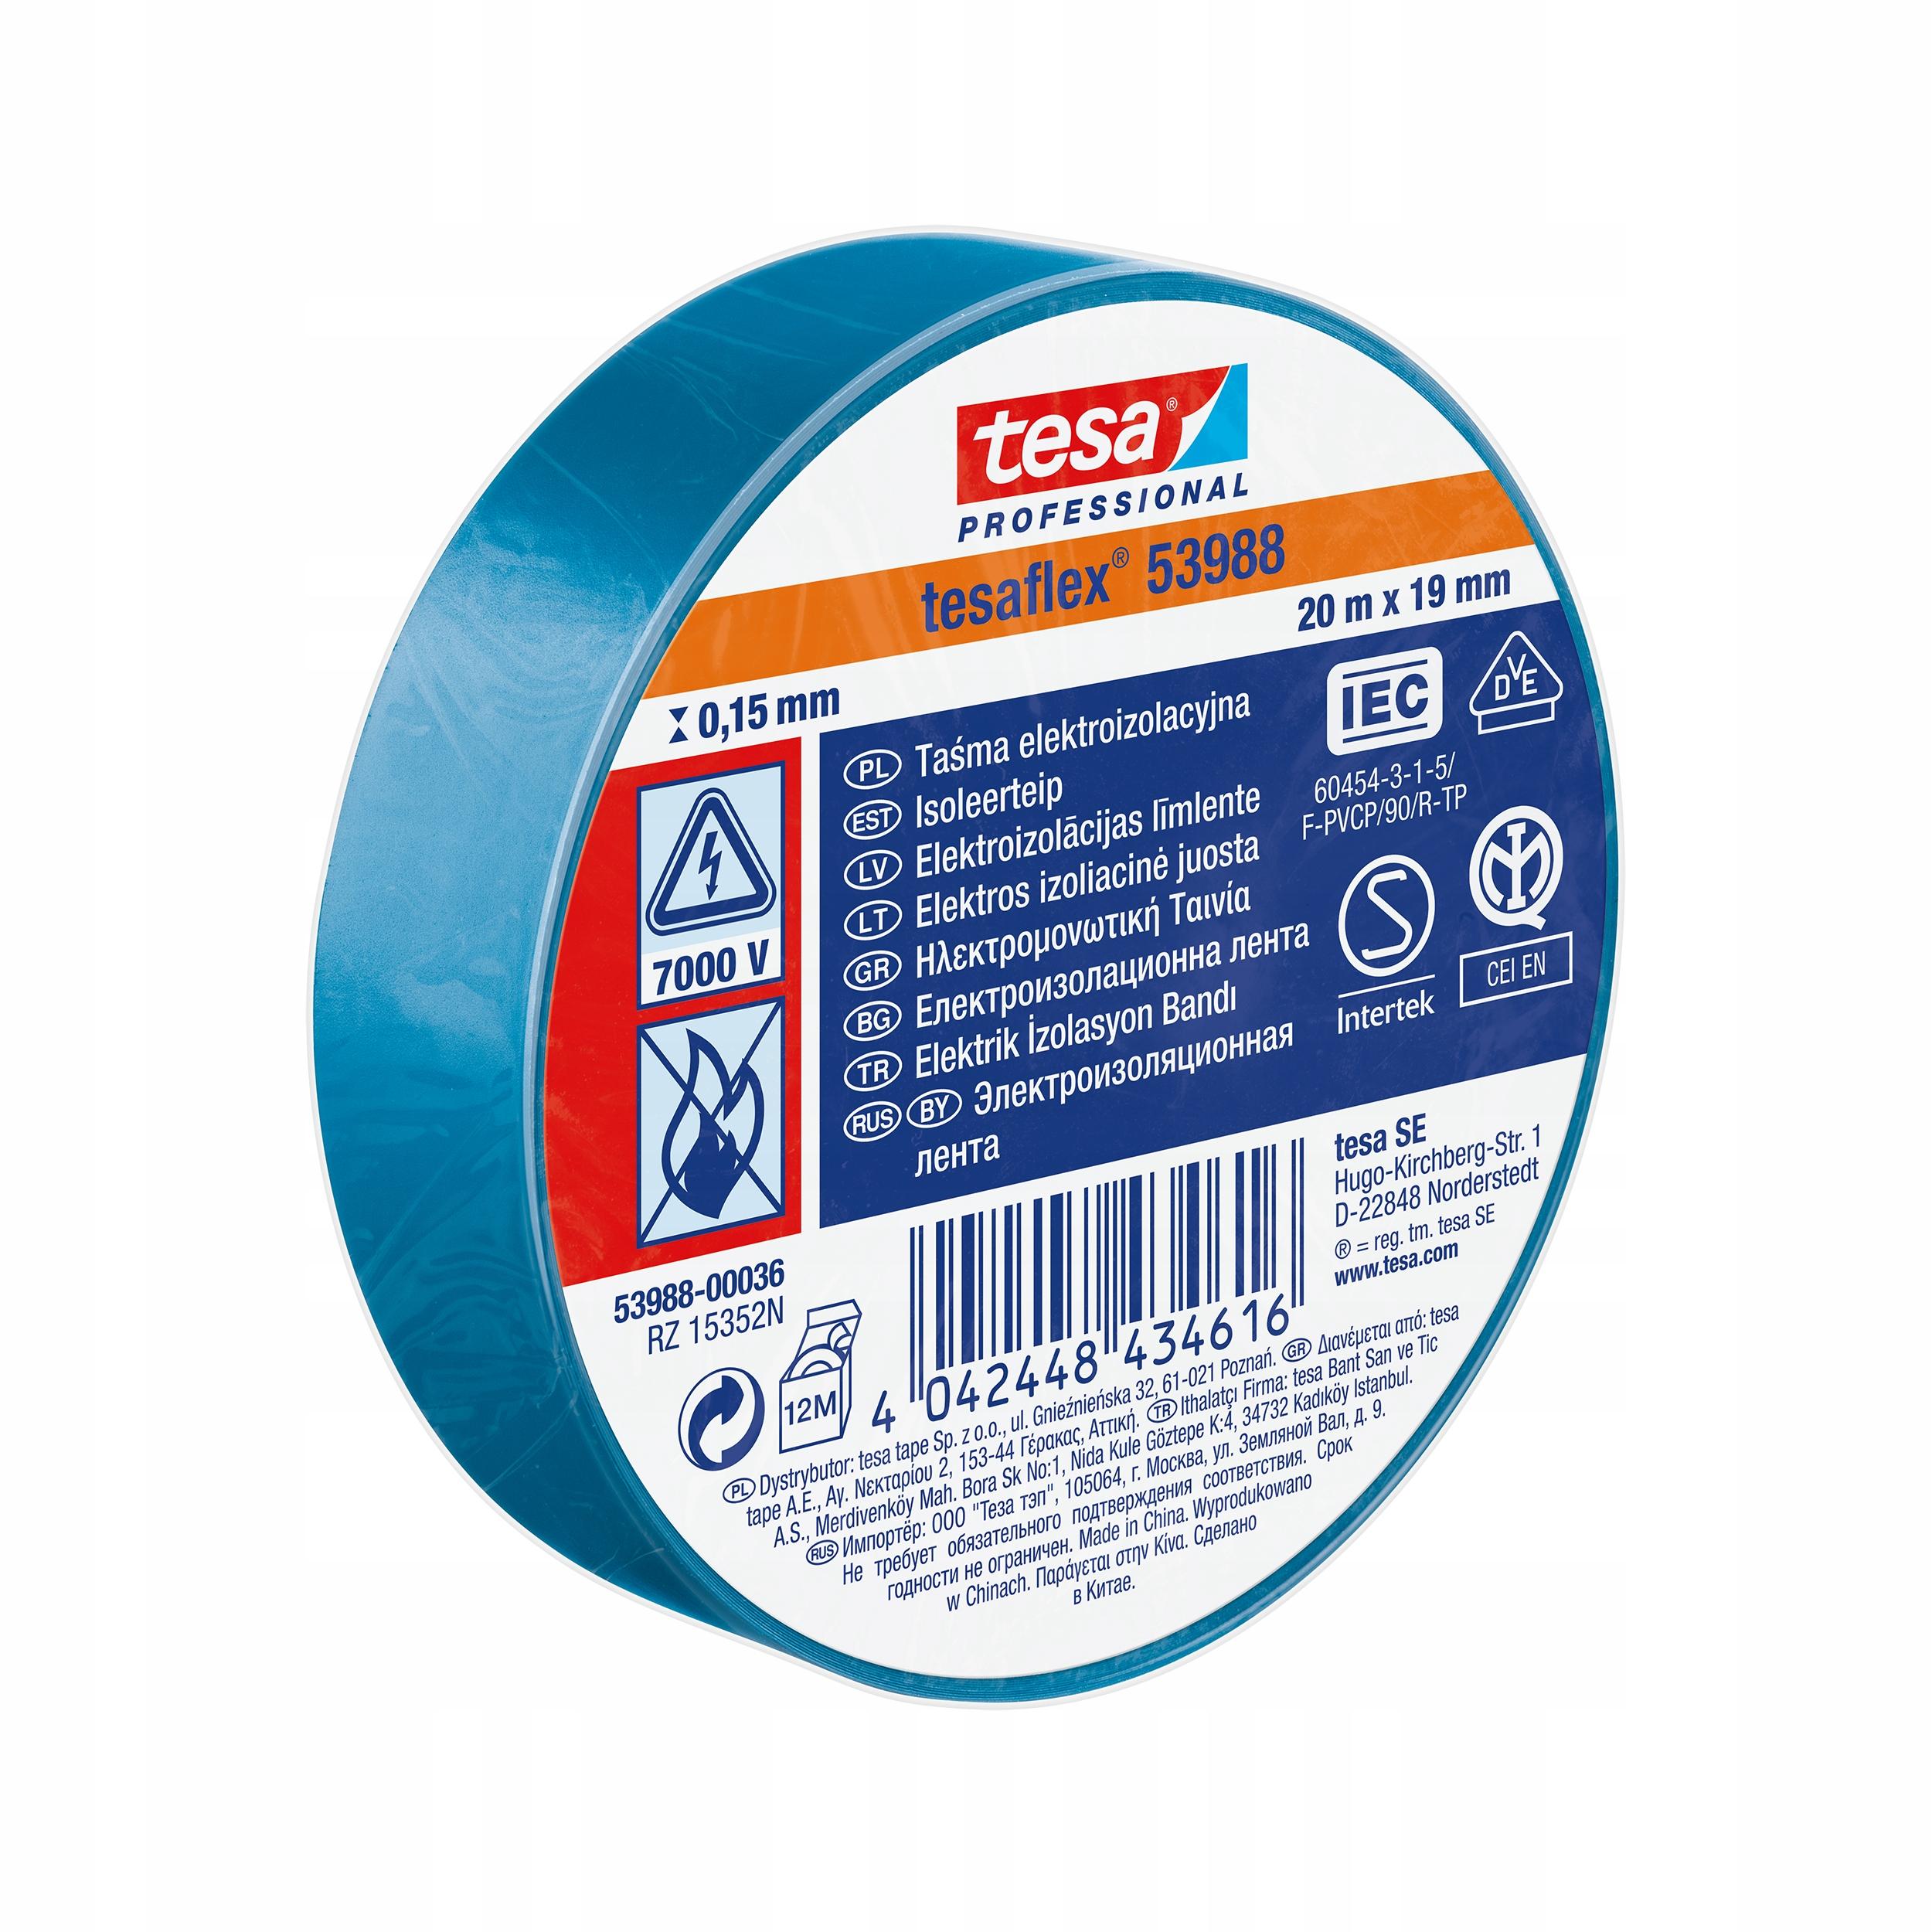 Изоляционная лента tesa, синяя 20 м x 19 мм